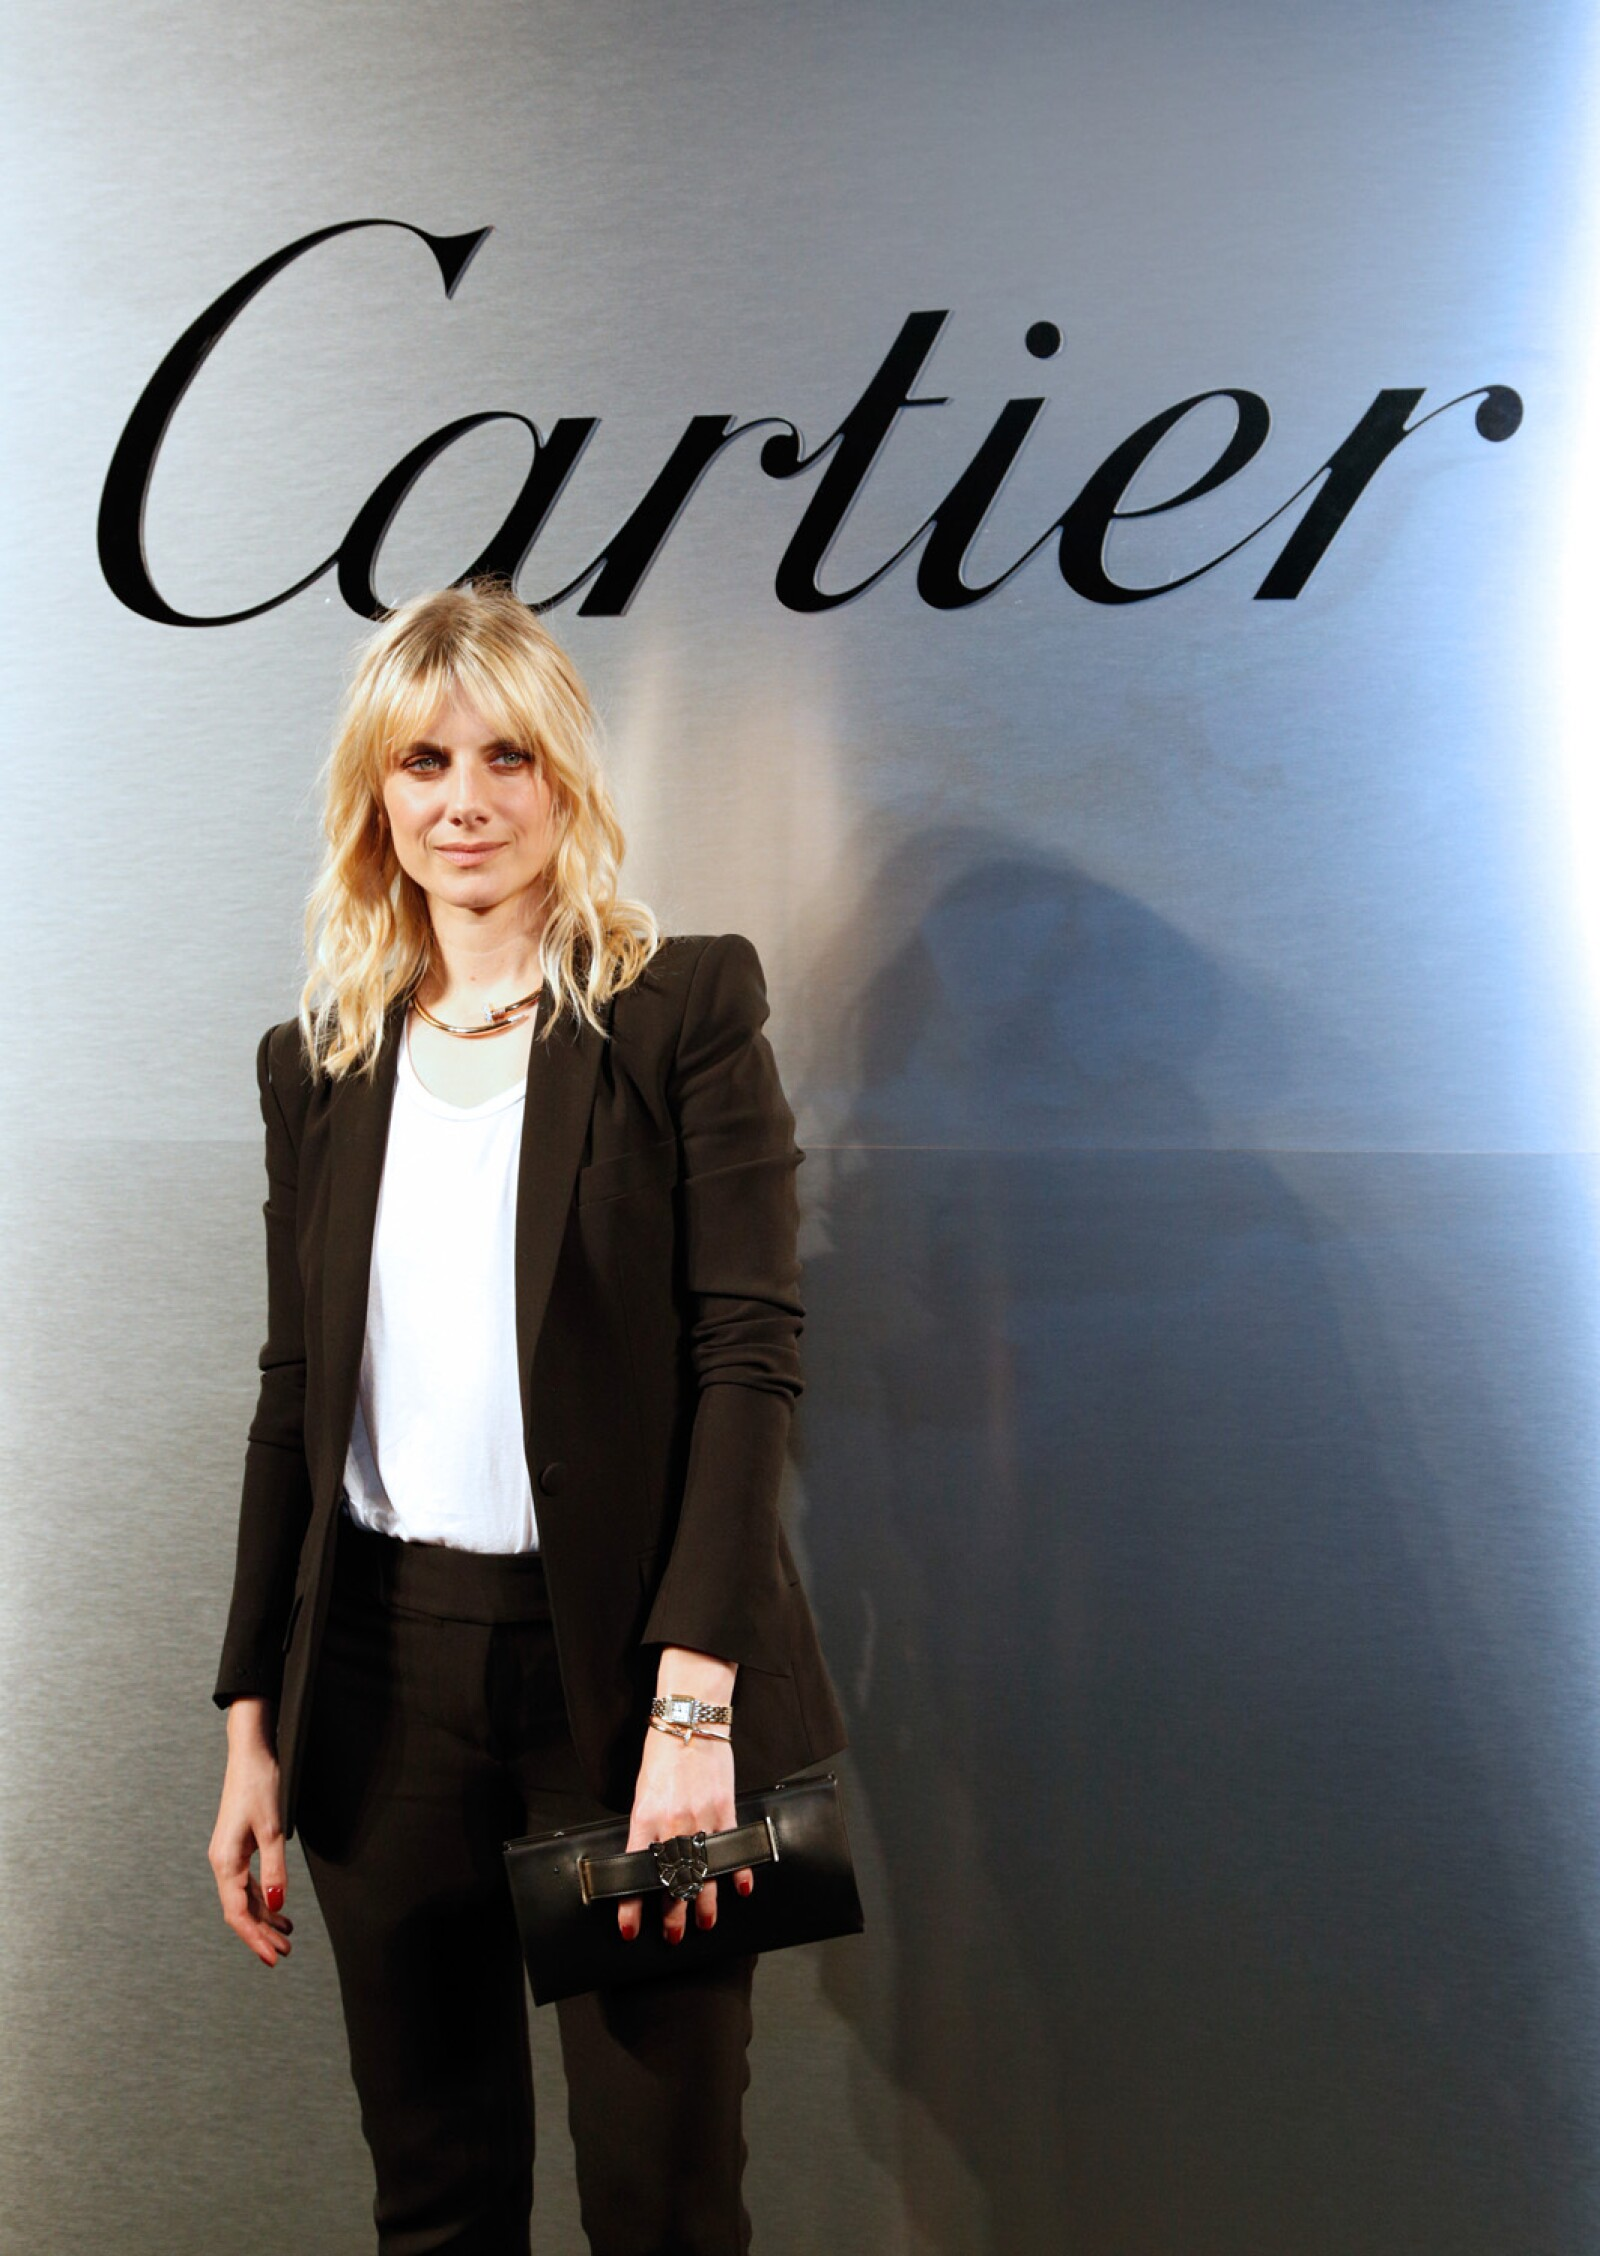 775150747LC00014_Cartier_Ce